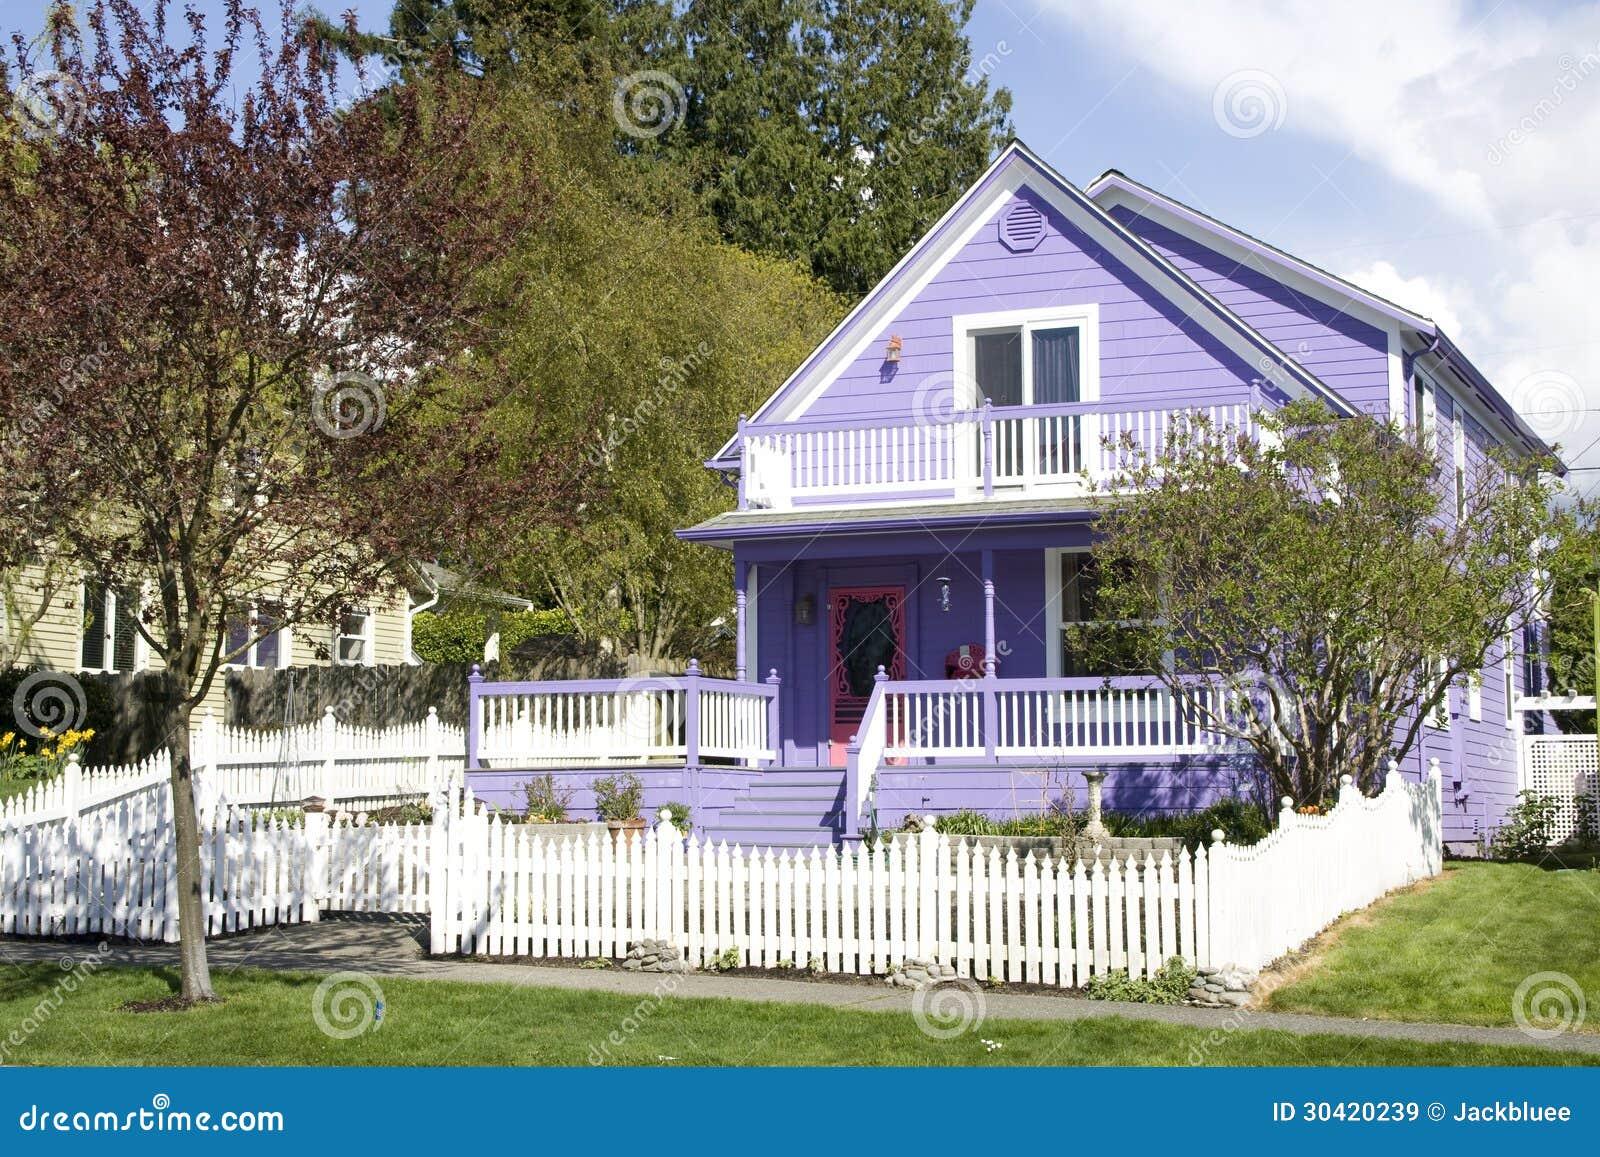 Beautiful purple house